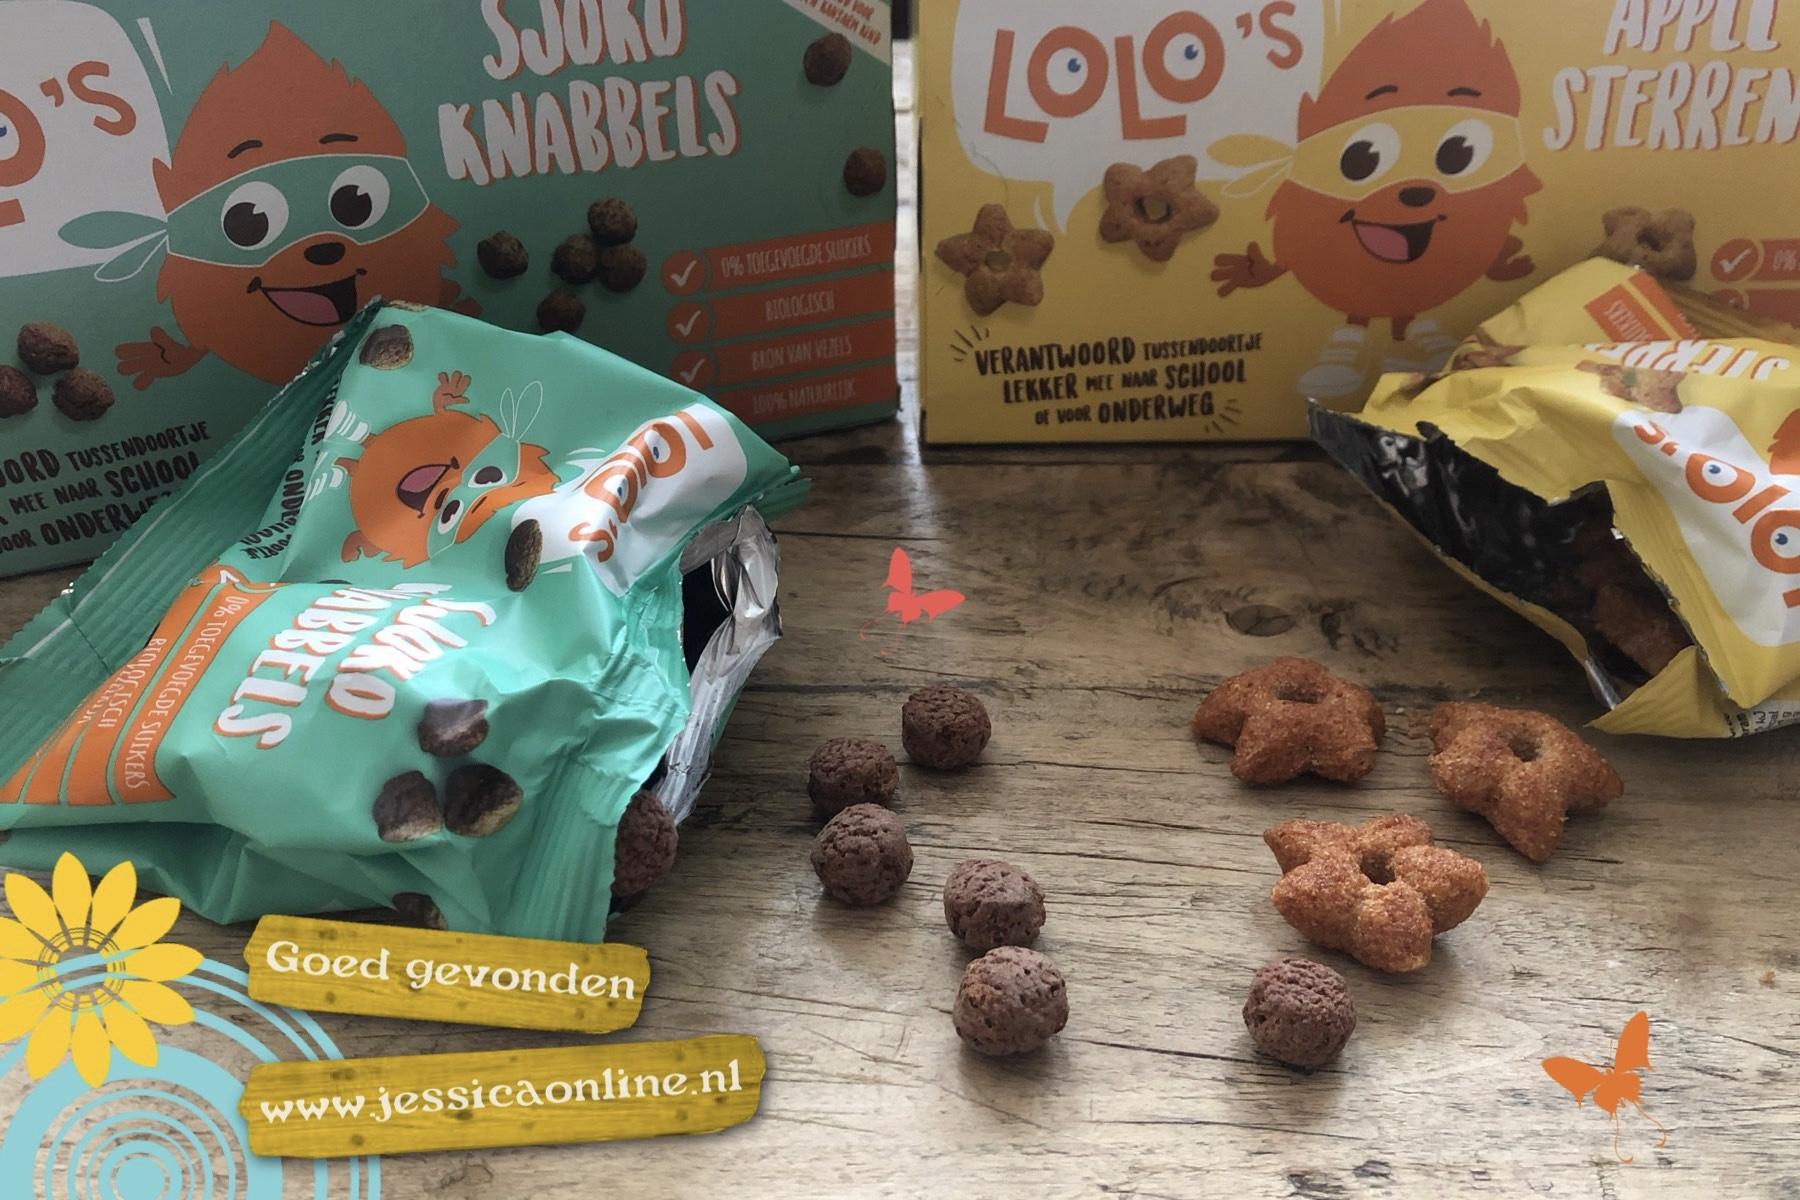 Lolo's bites - JessicaOnline.nl